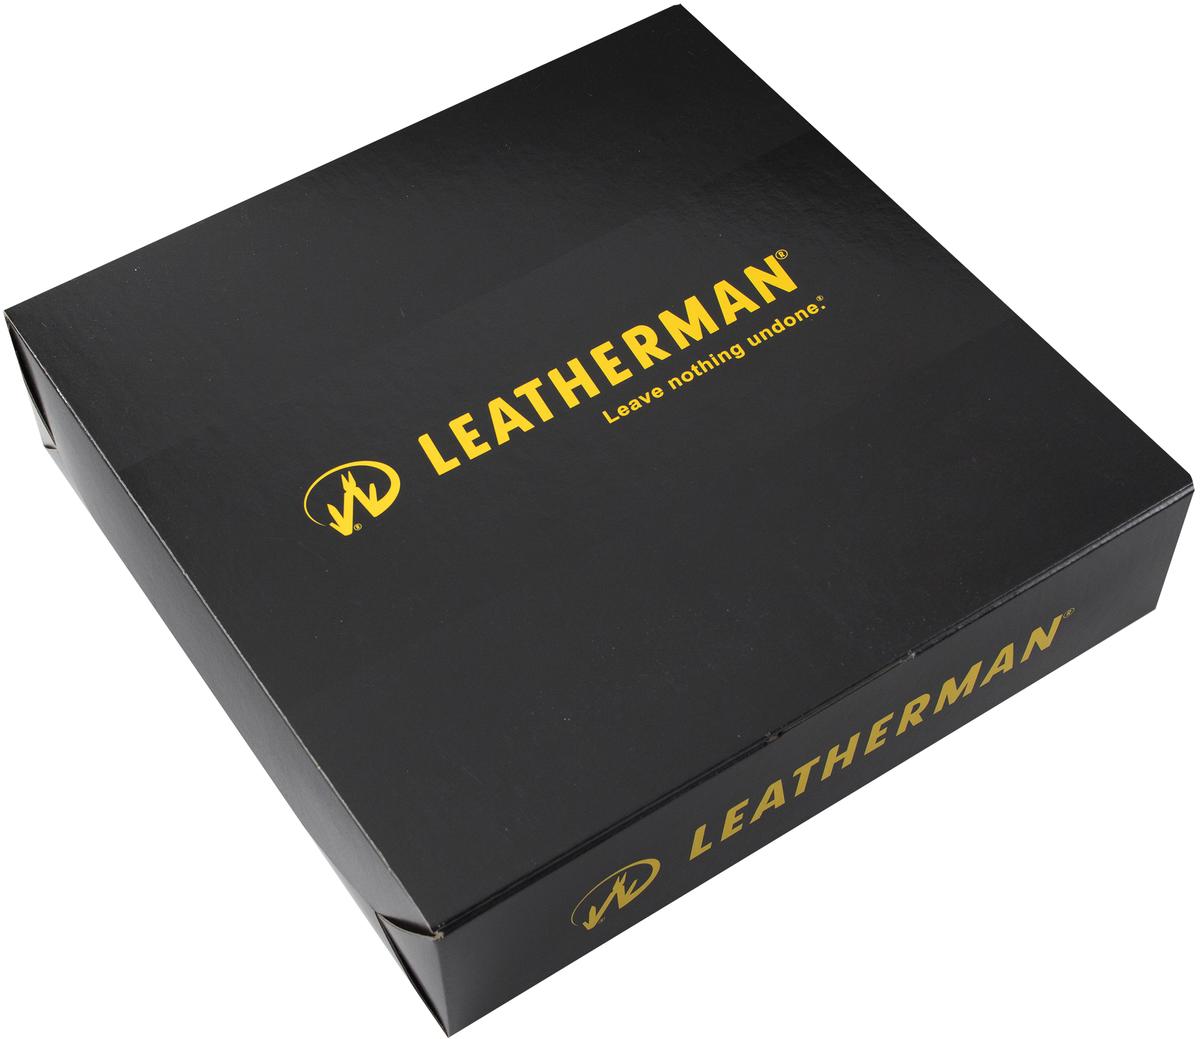 f03_leatherman_gift_box_4